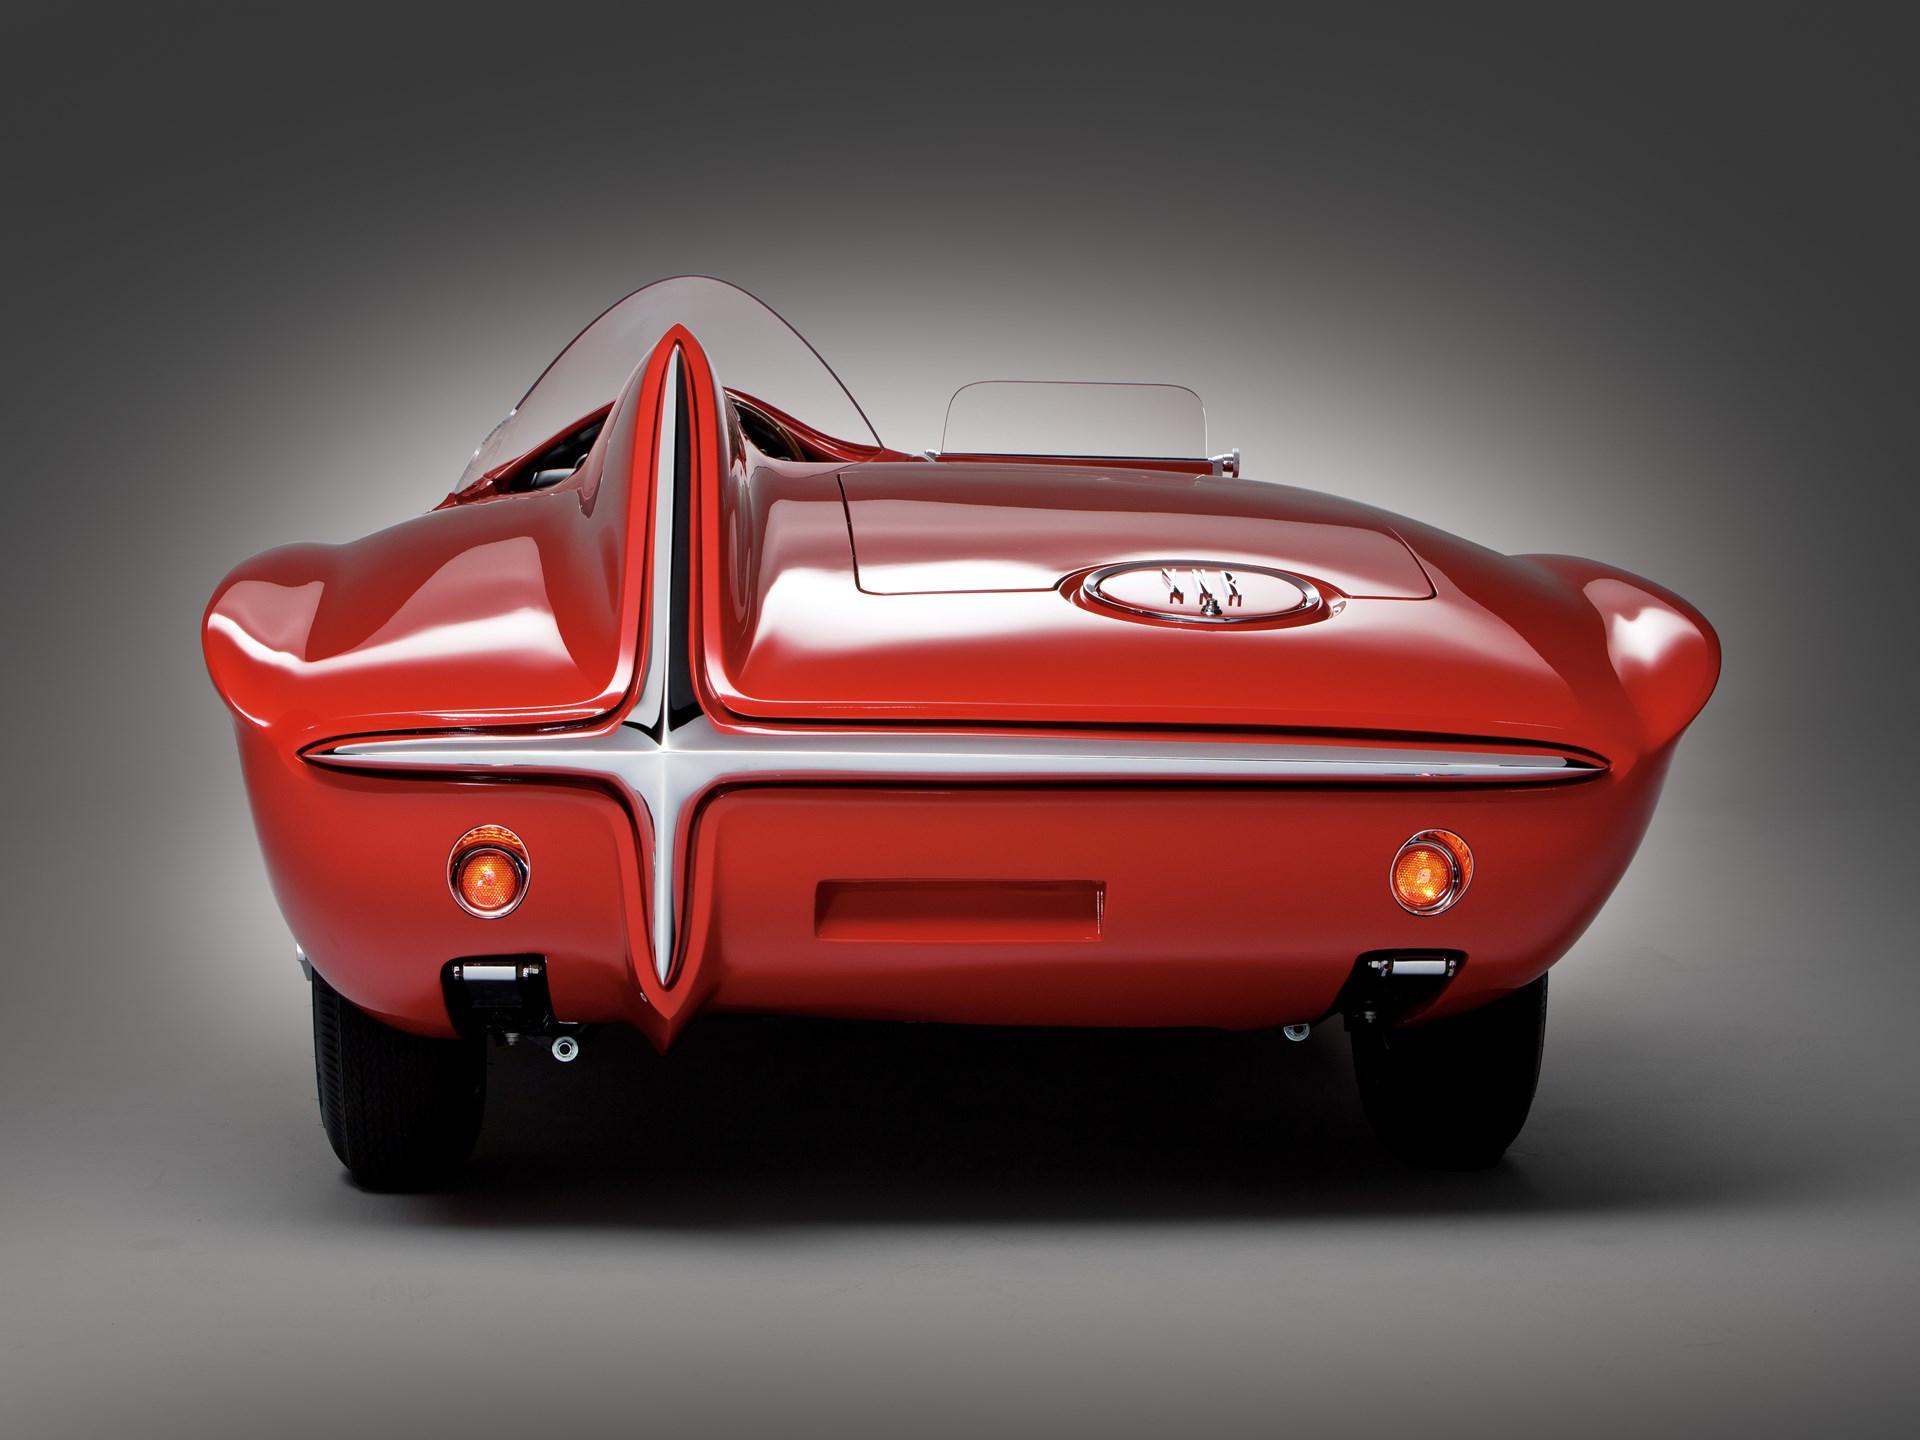 Rm Sothebys 1960 Plymouth Xnr Monterey 2012 Valiant For Sale